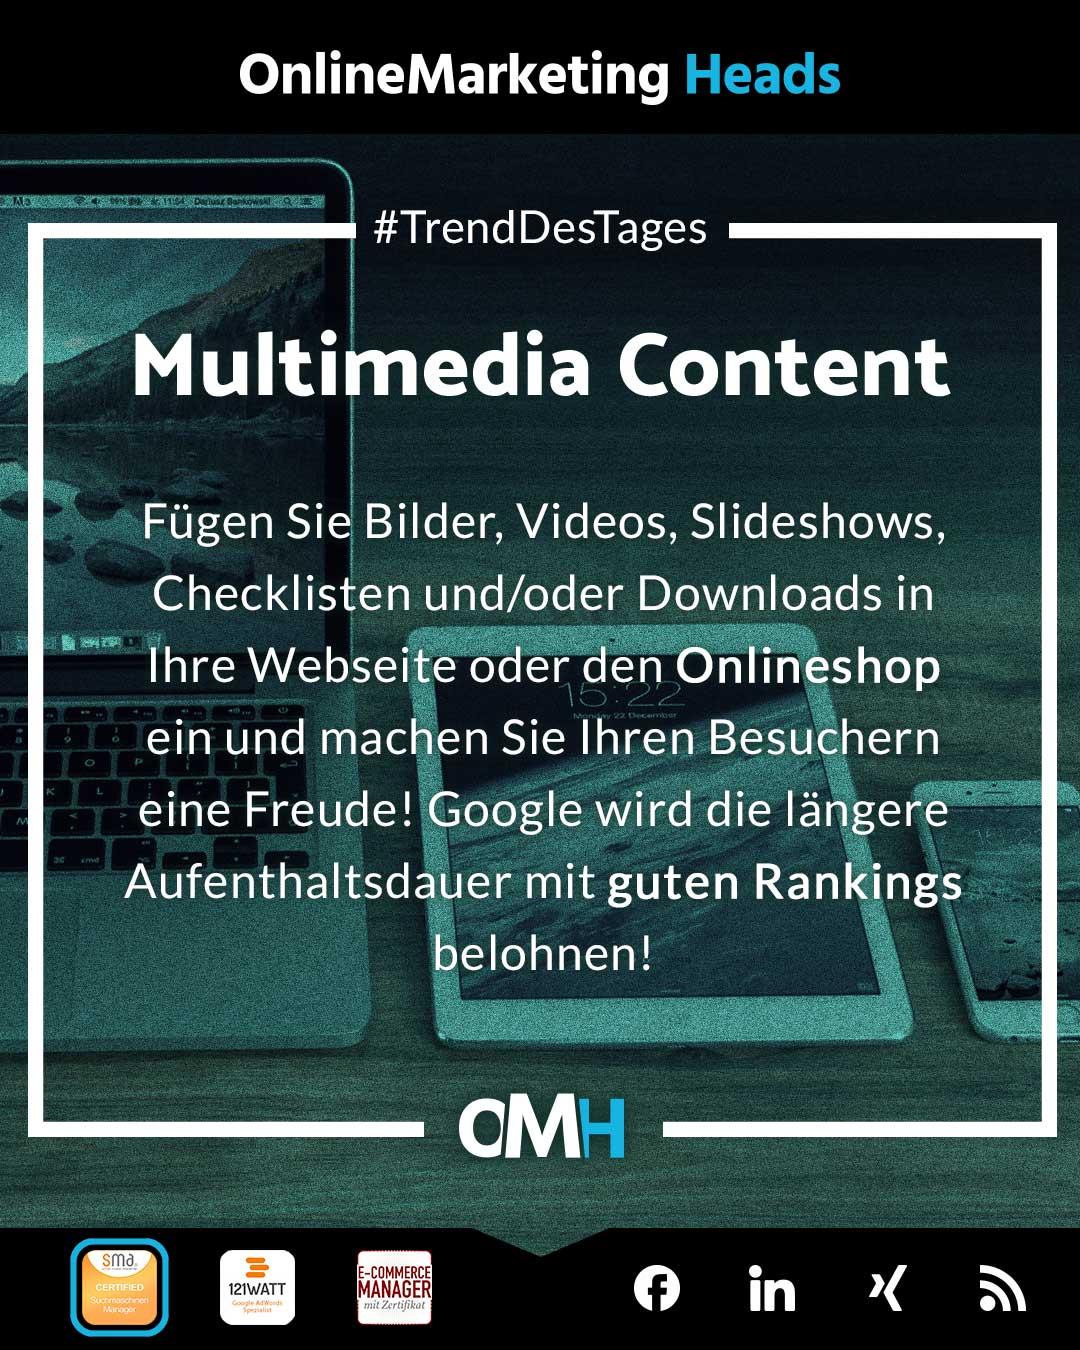 Multimedia Content SEO Trend 2021 OnlineMarketing Heads